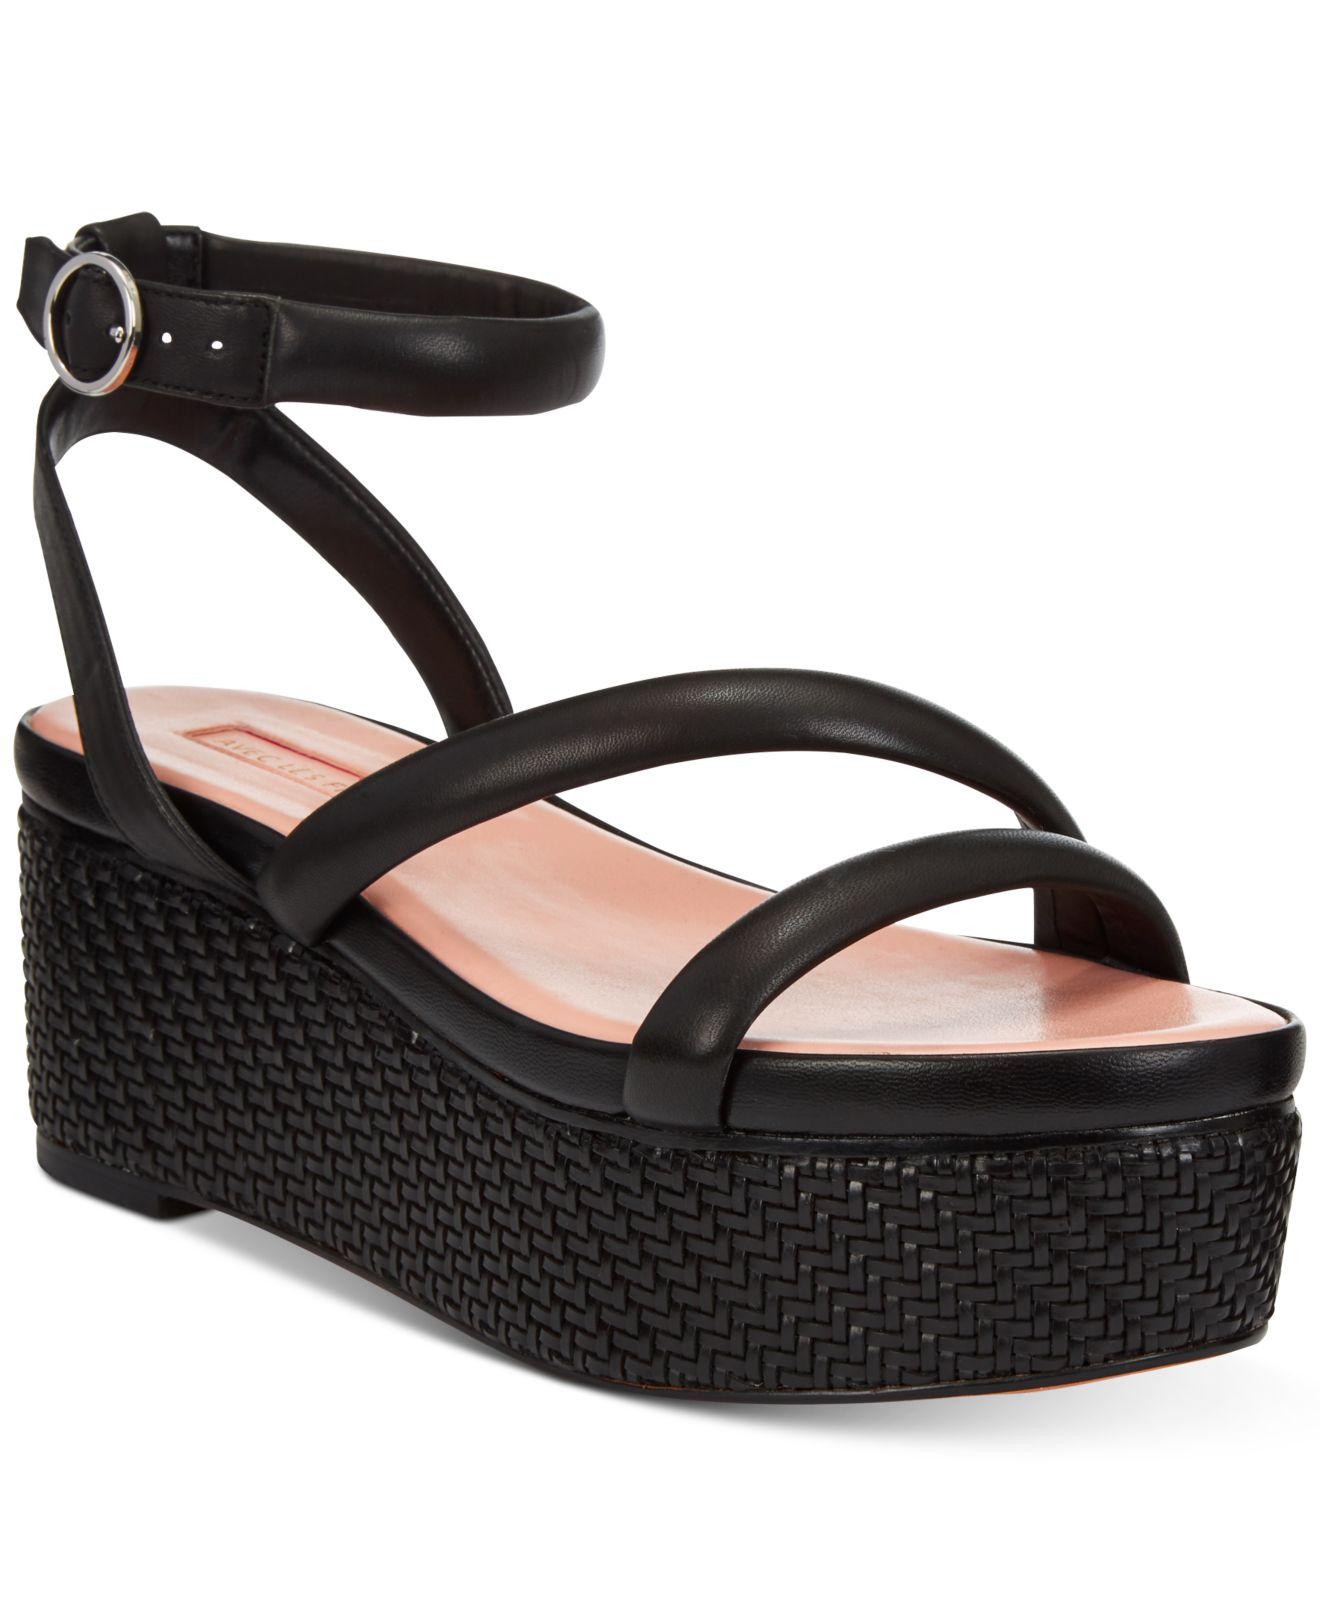 8b2028da09c5 Lyst - Avec Les Filles Ava Flatform Sandals in Black